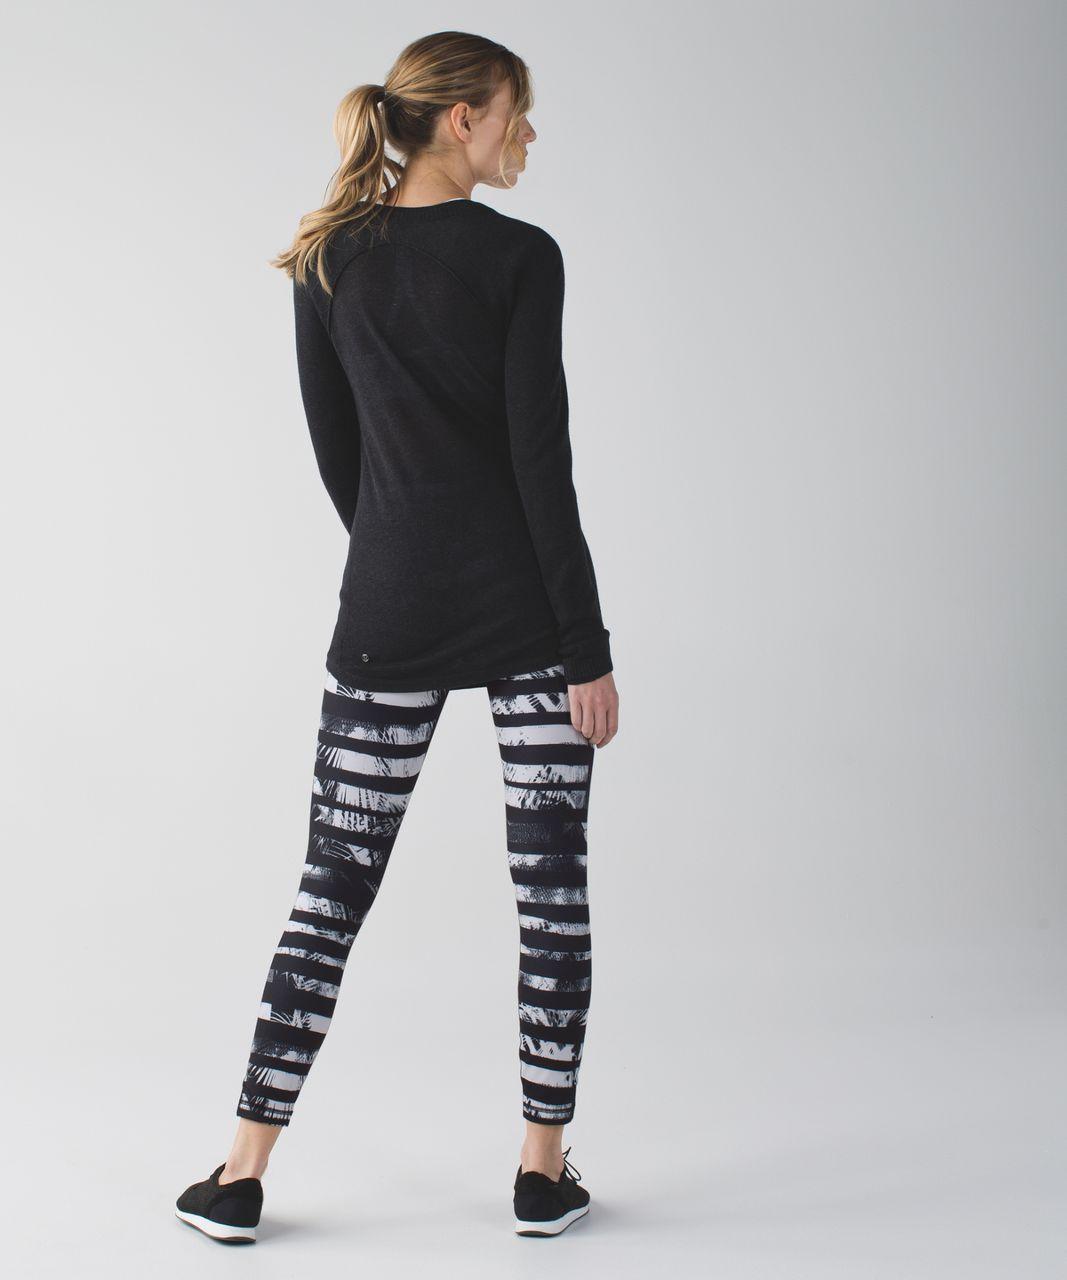 Lululemon High Times Pant *Full-On Luon - Shady Palms Black White